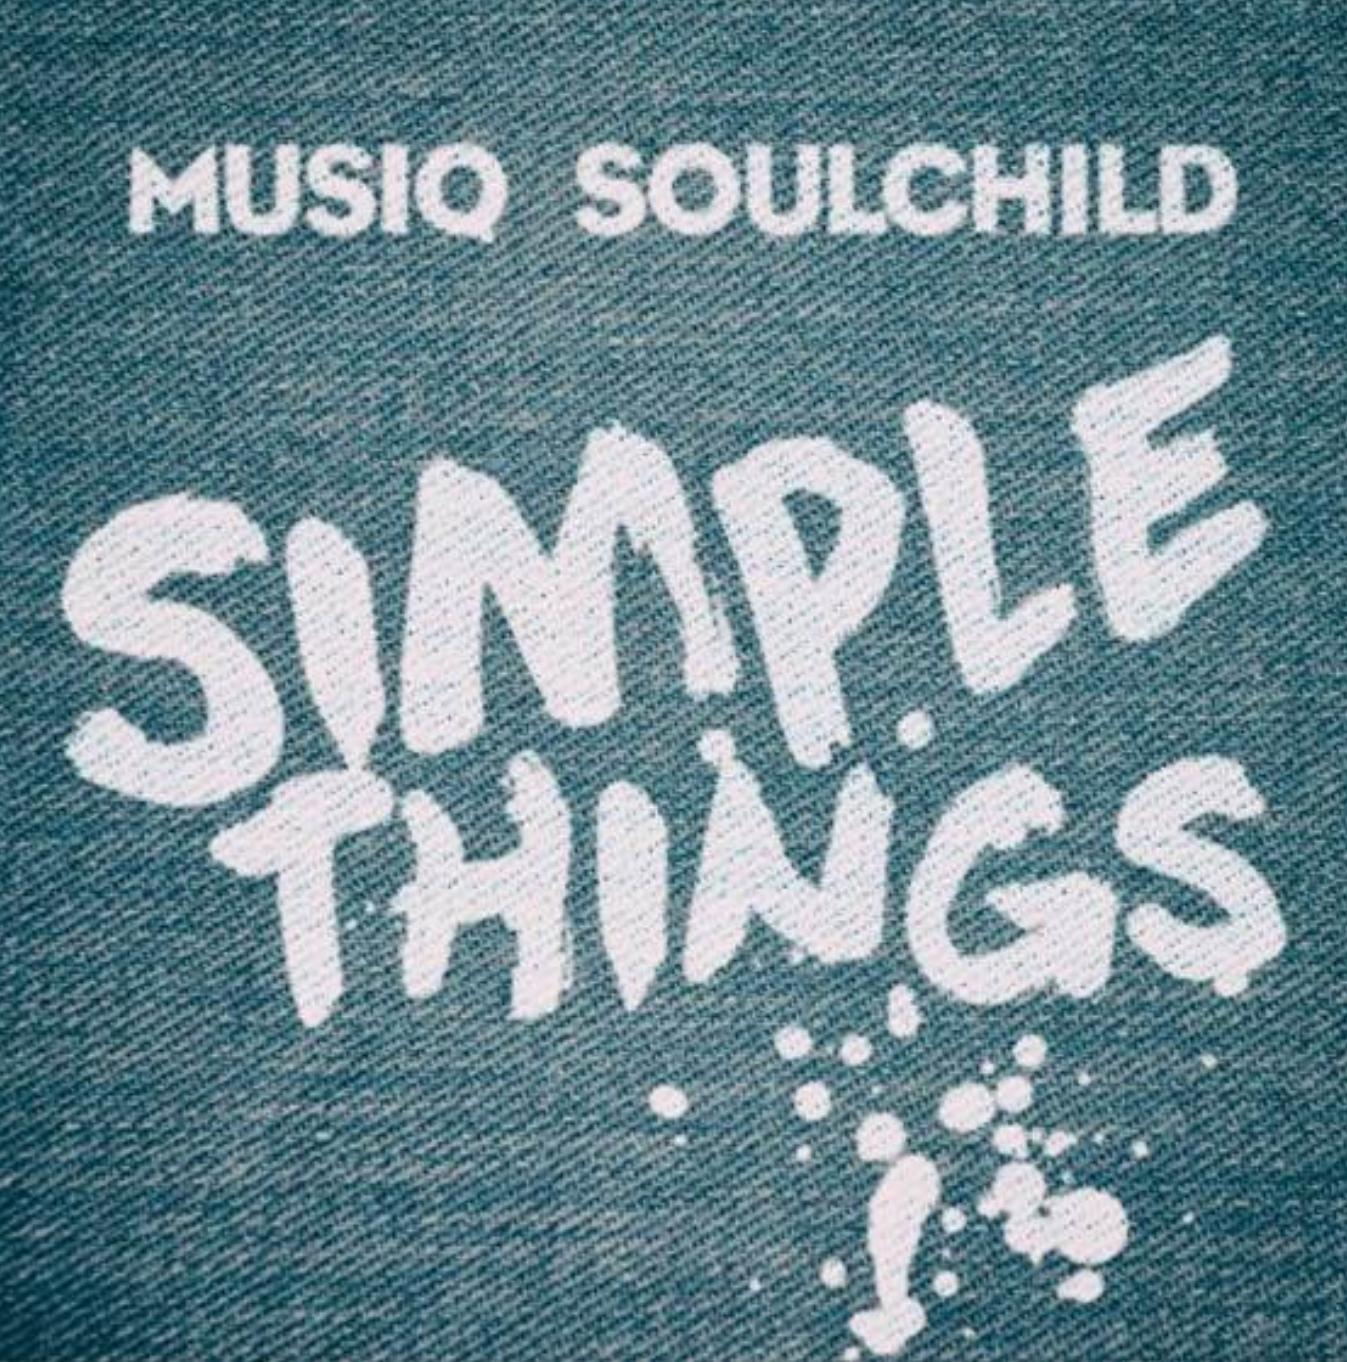 Musiq Soulchild Simple Things